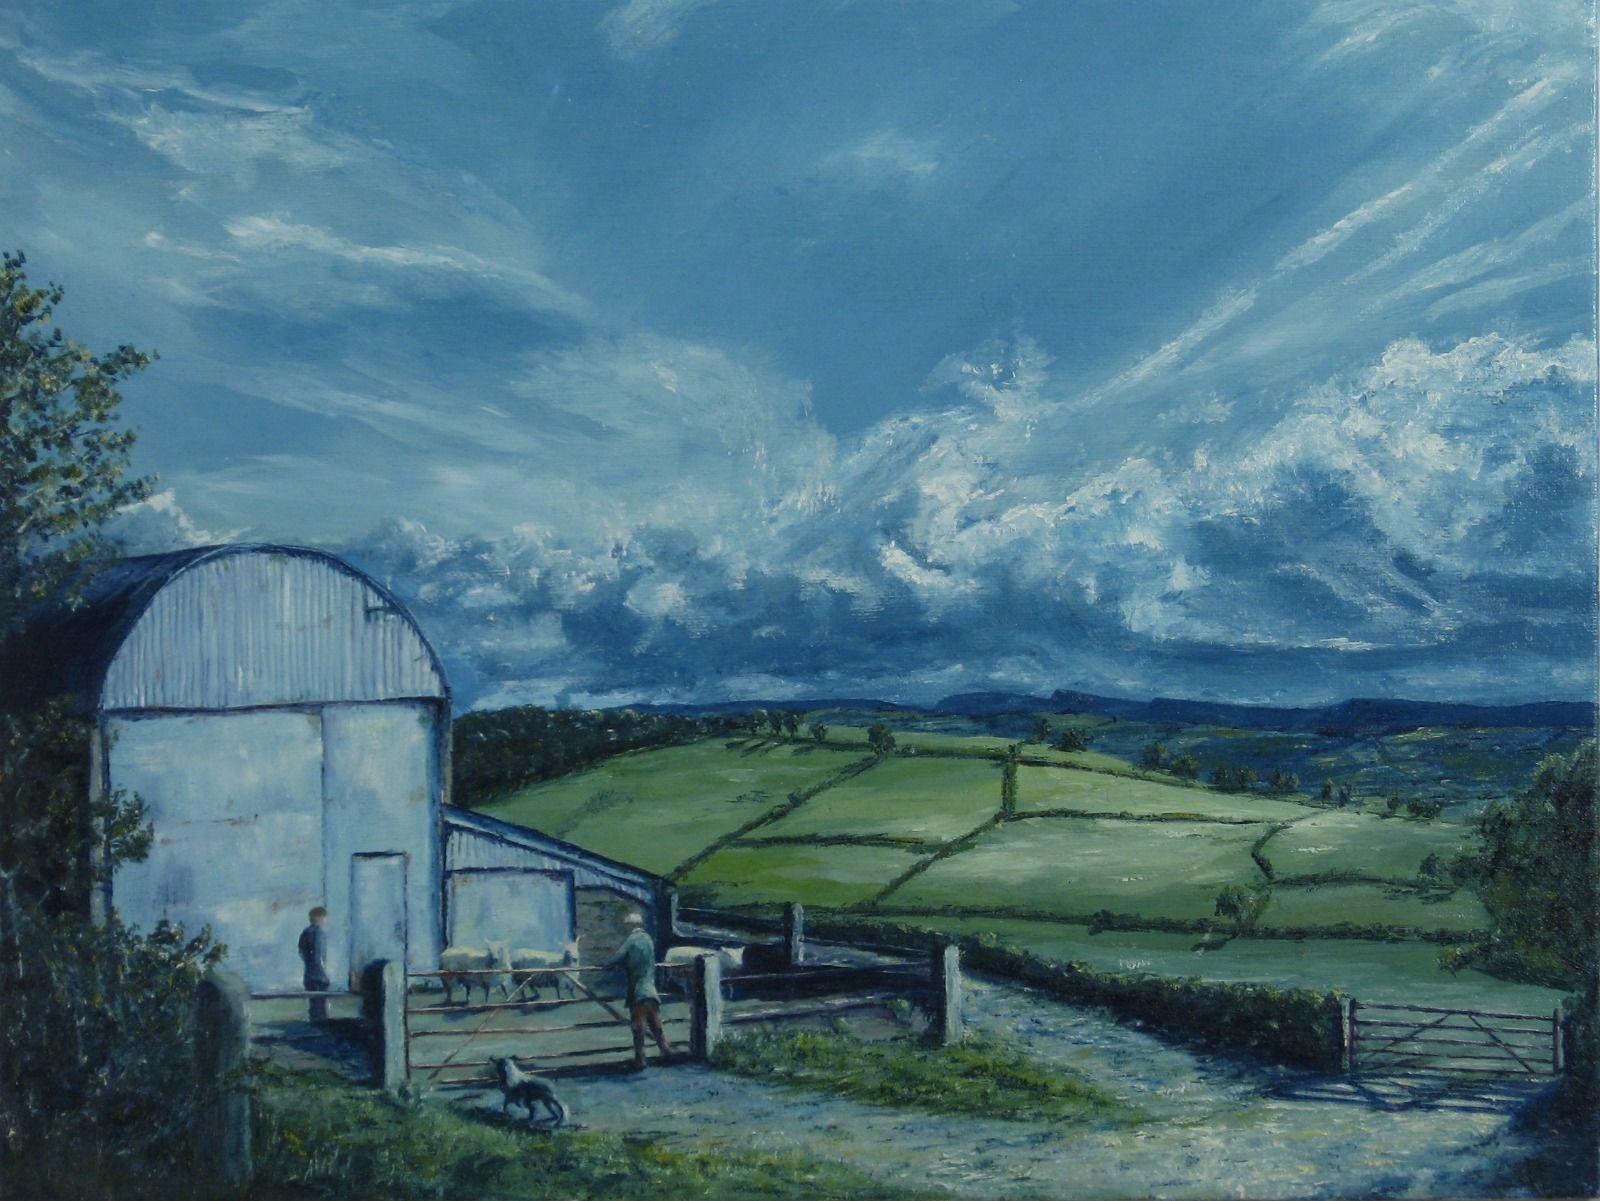 Looking at a pen of sheep, Llansawel, Carmarthenshire